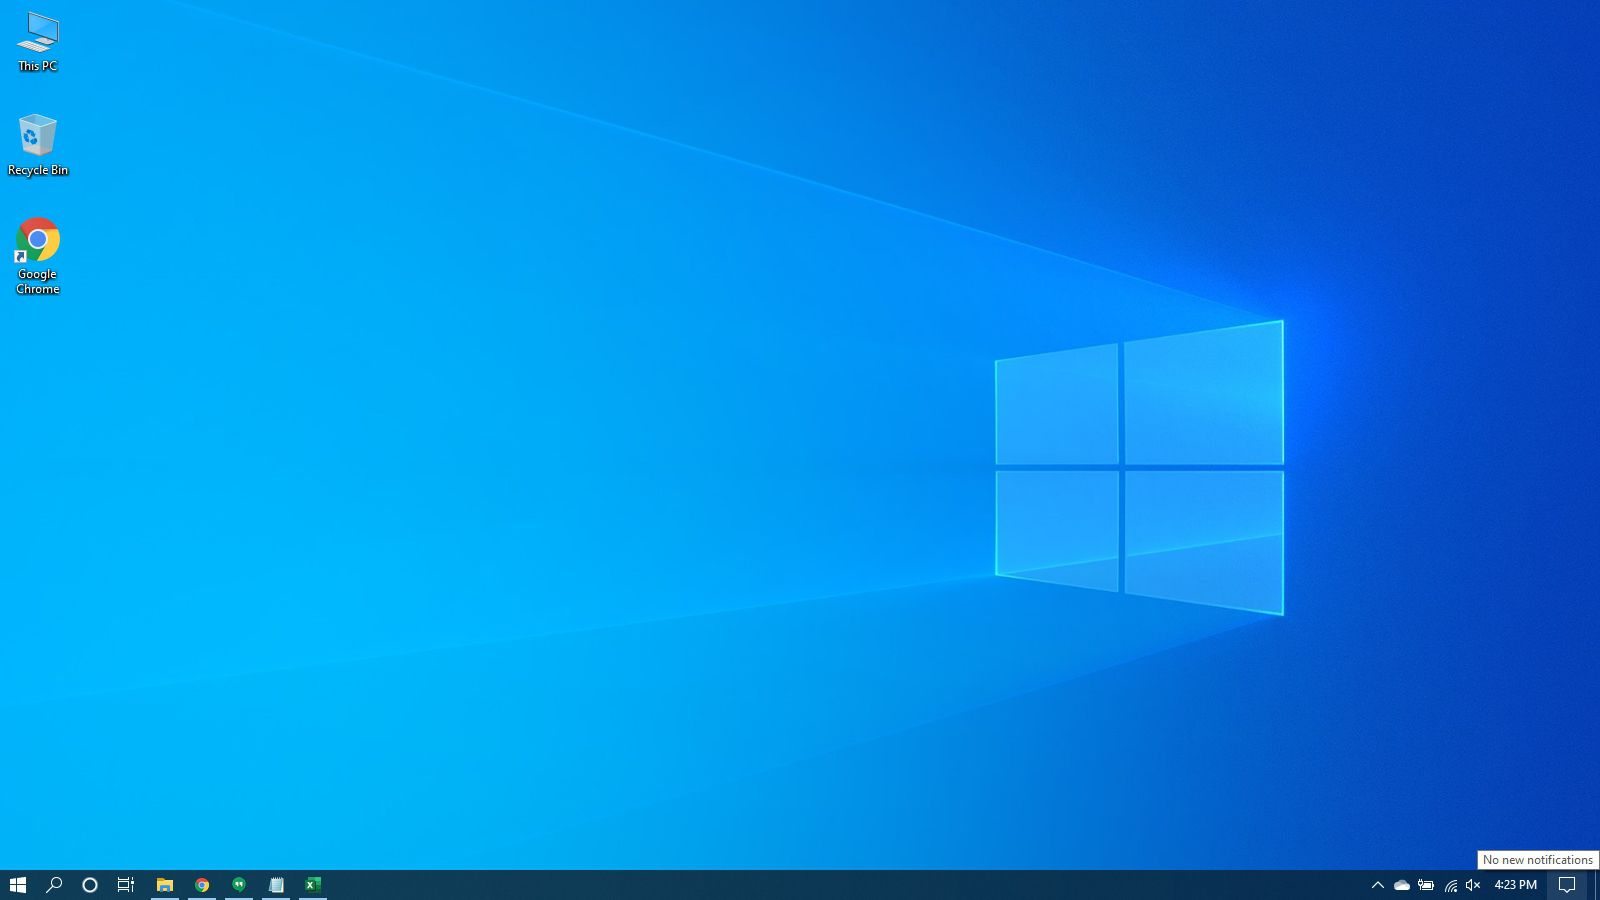 How To Change A Windows 10 Login Screen